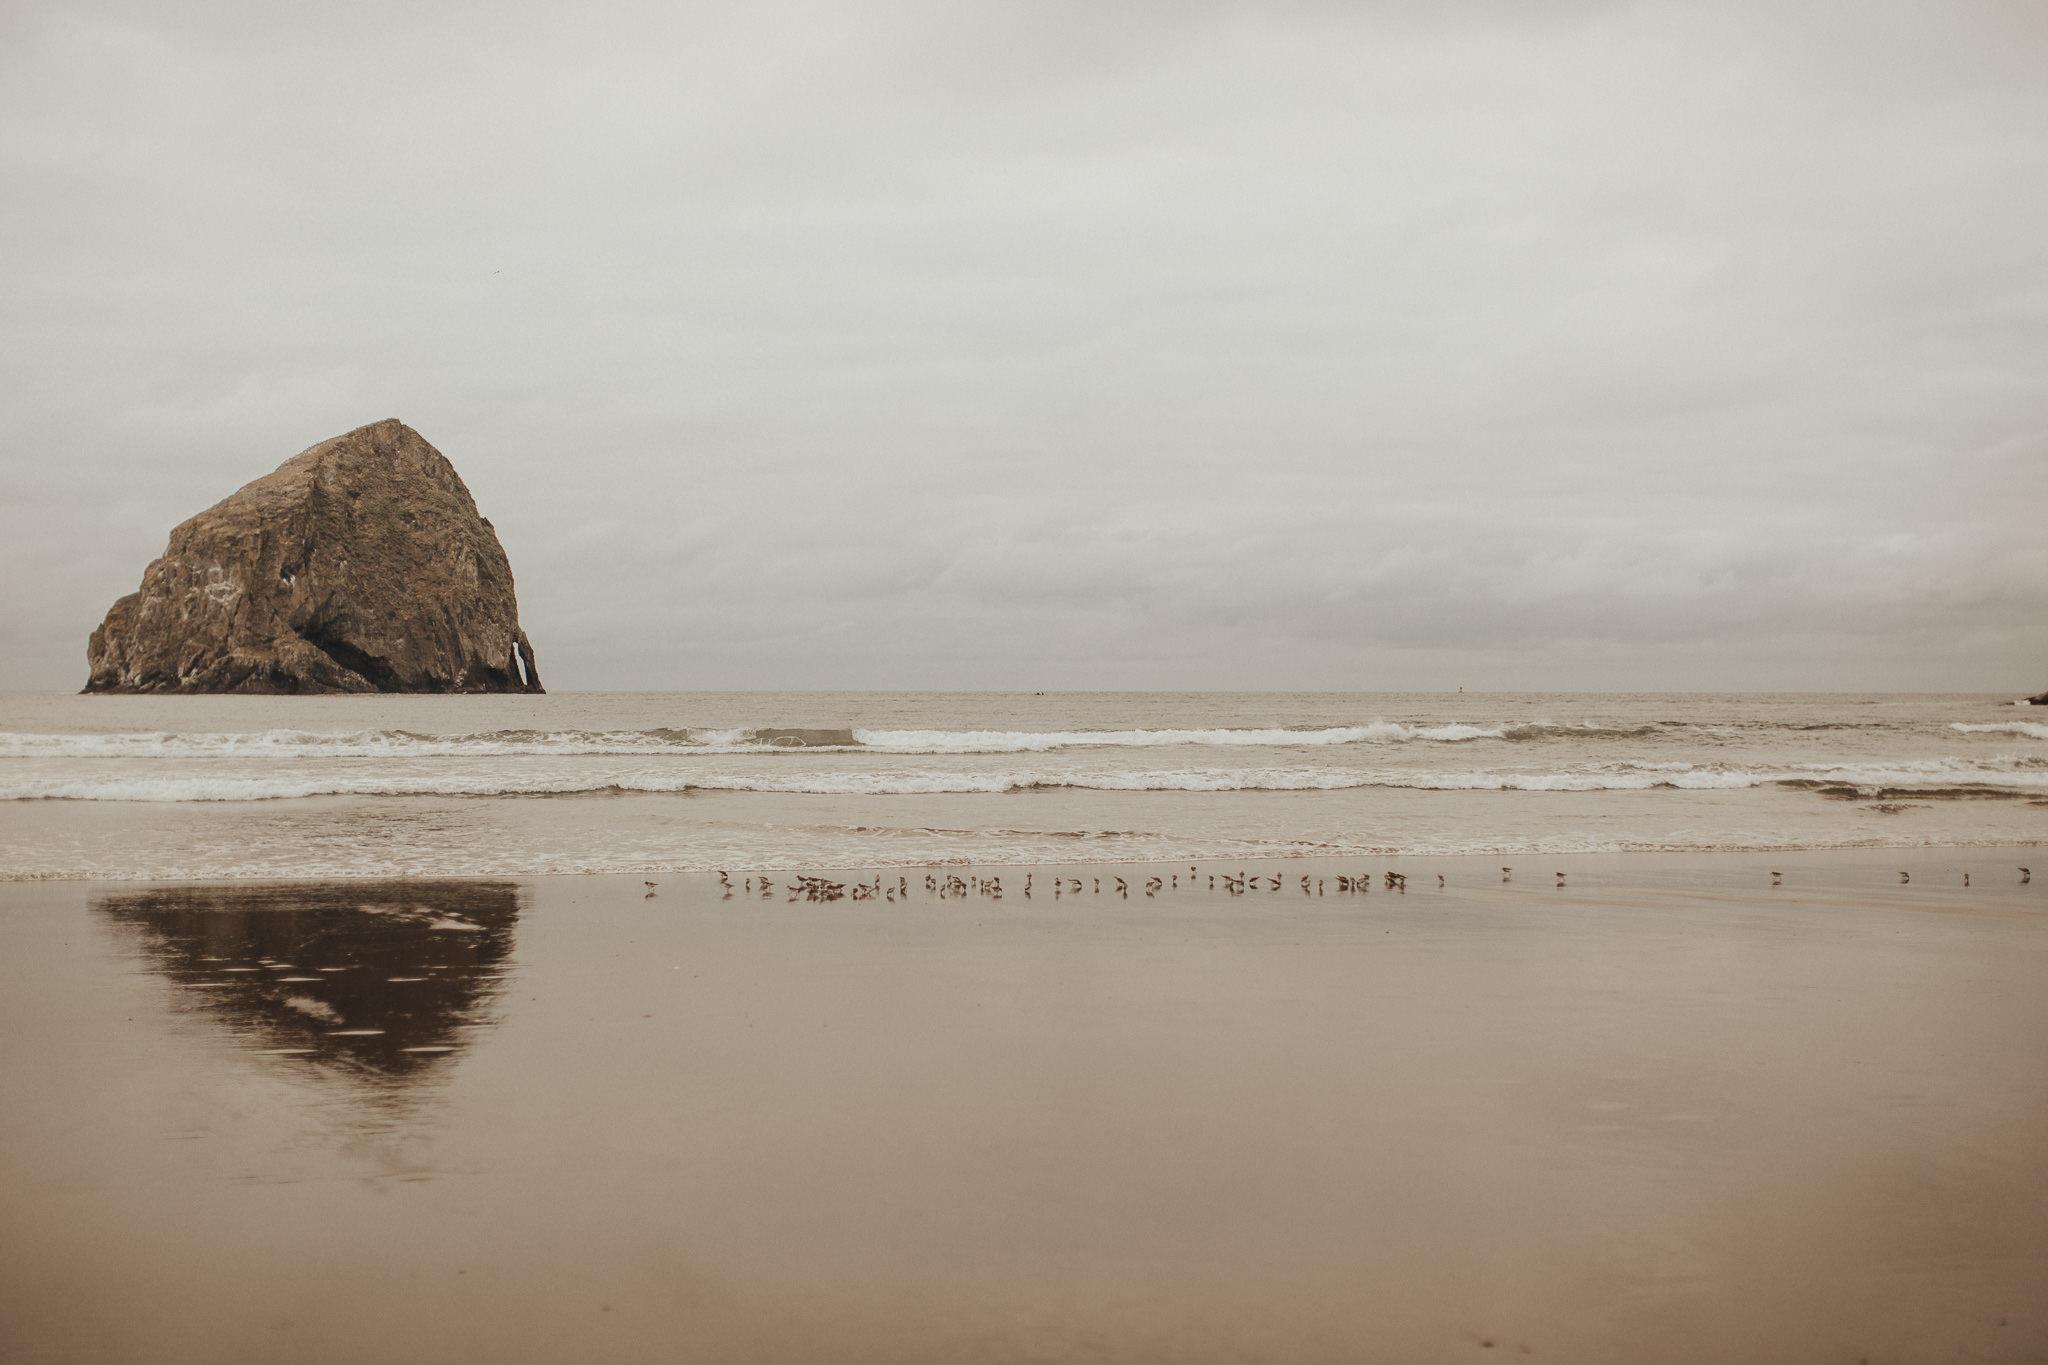 Cape Kiwanda - Elopement - Oregon - Wedding Photographer - Pat Cori Photography - 01.jpg